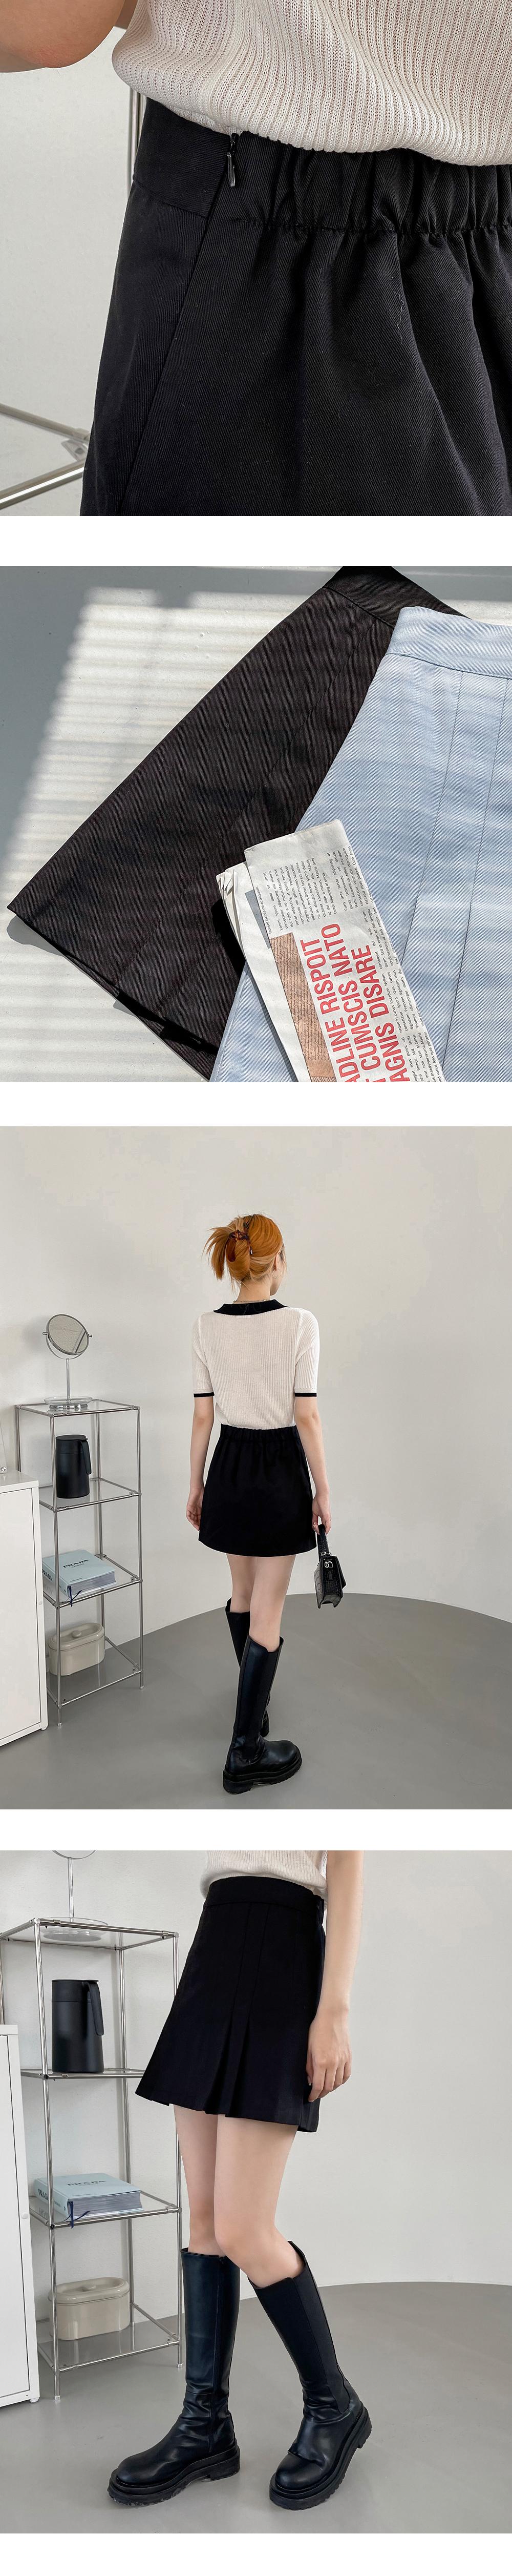 Grami banding pleated mini skirt